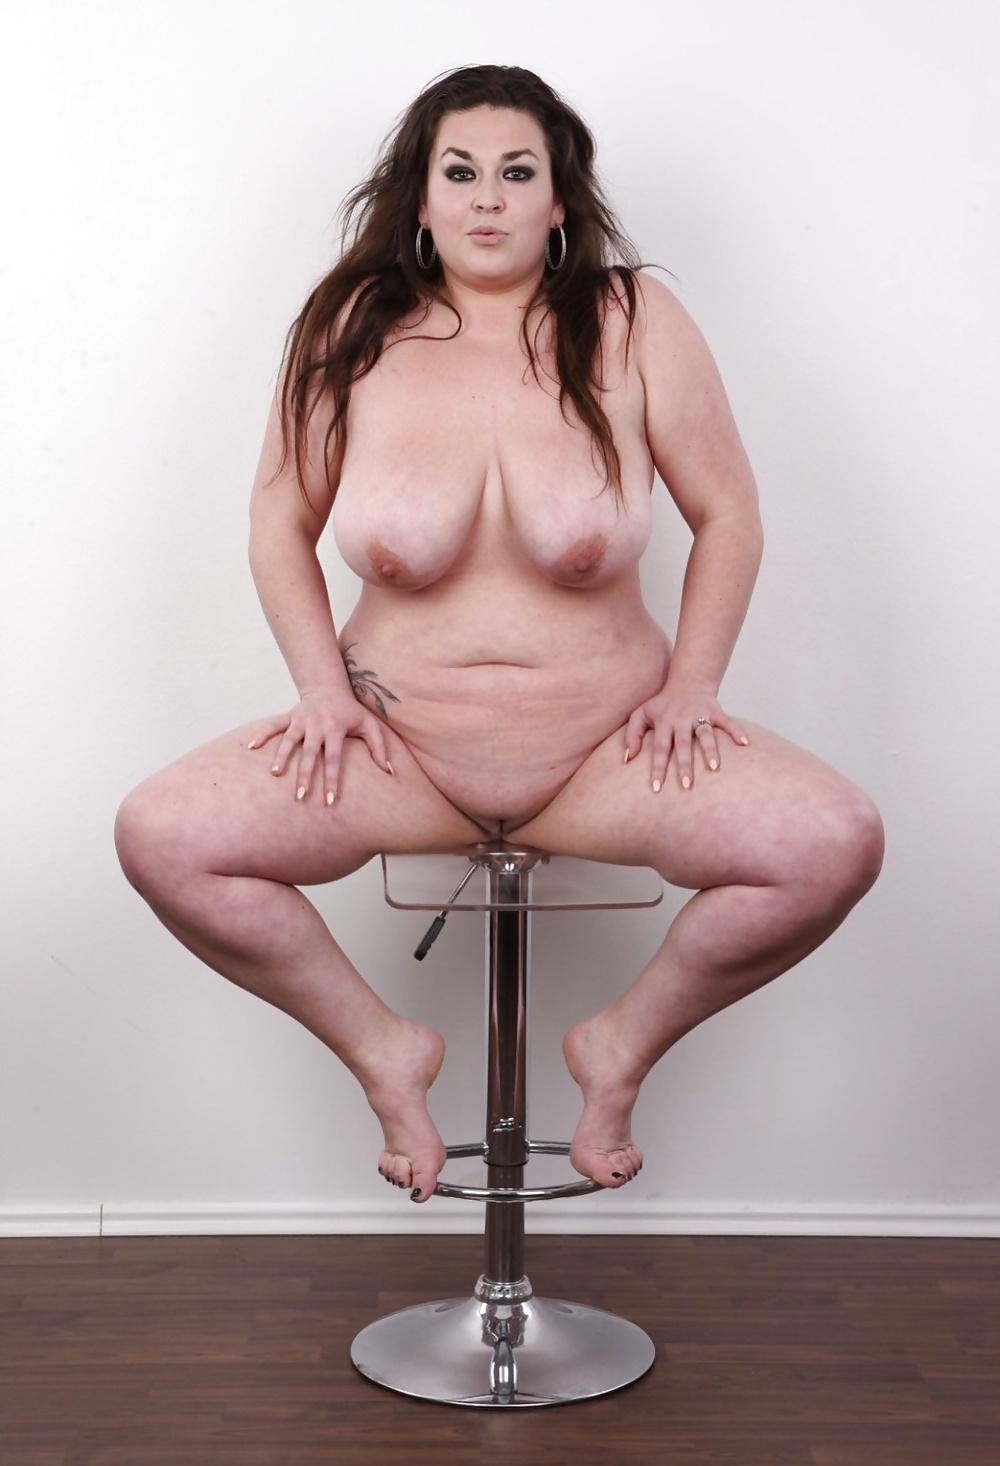 кастинг толстух порно